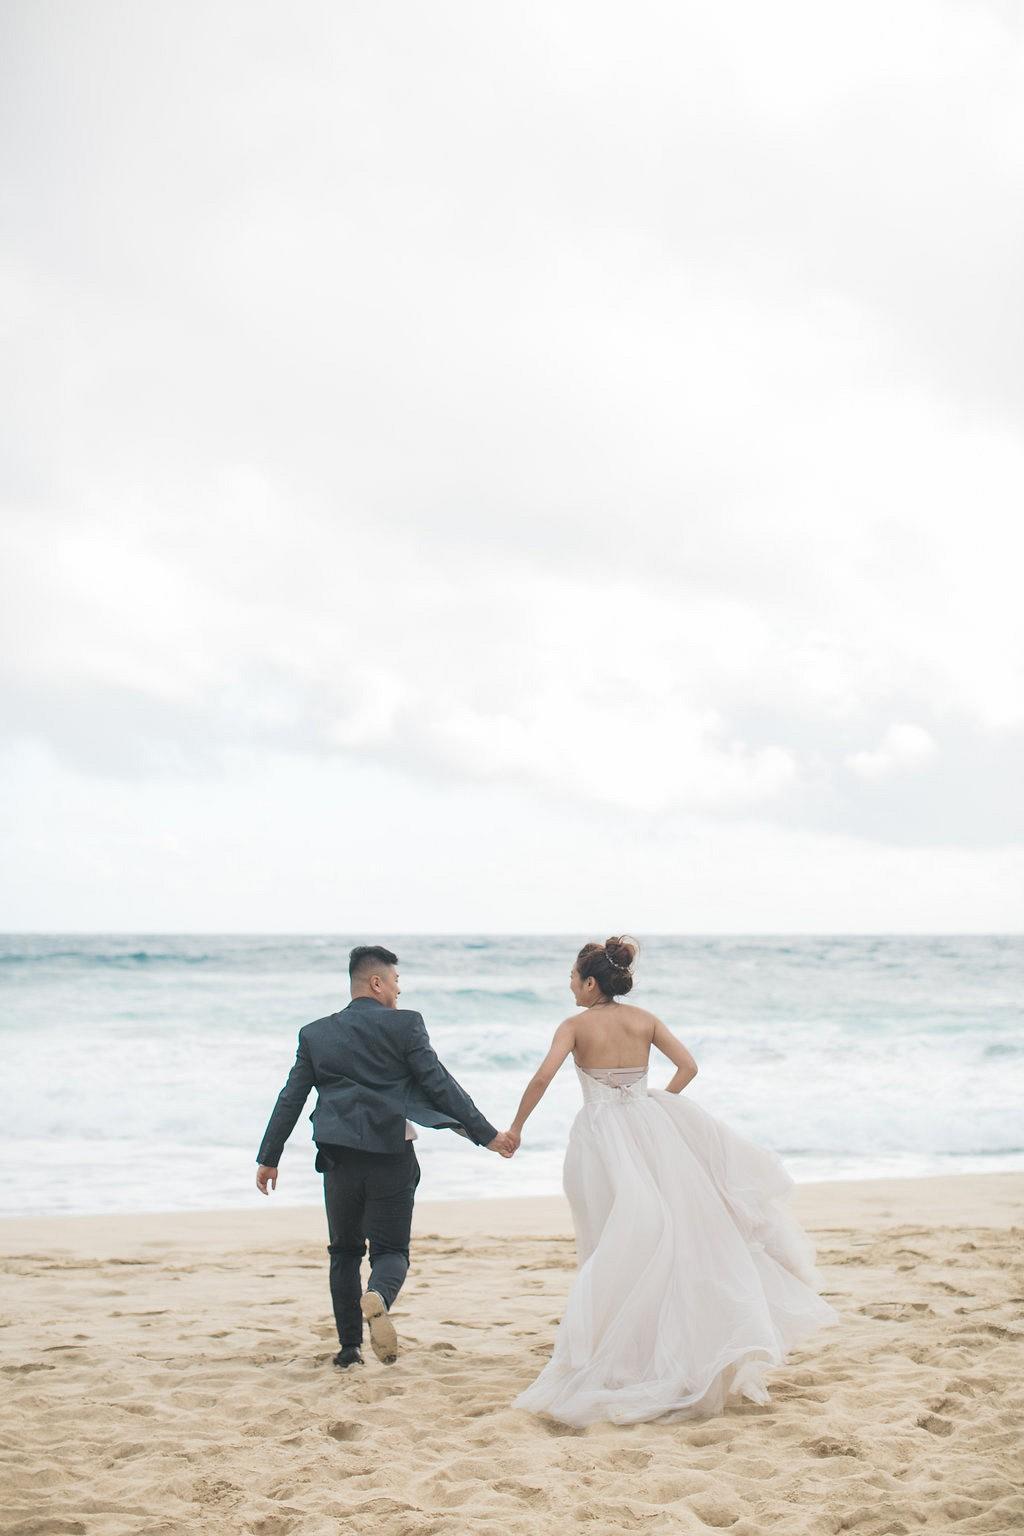 Lin and Hailong's Oahu Island Elopement